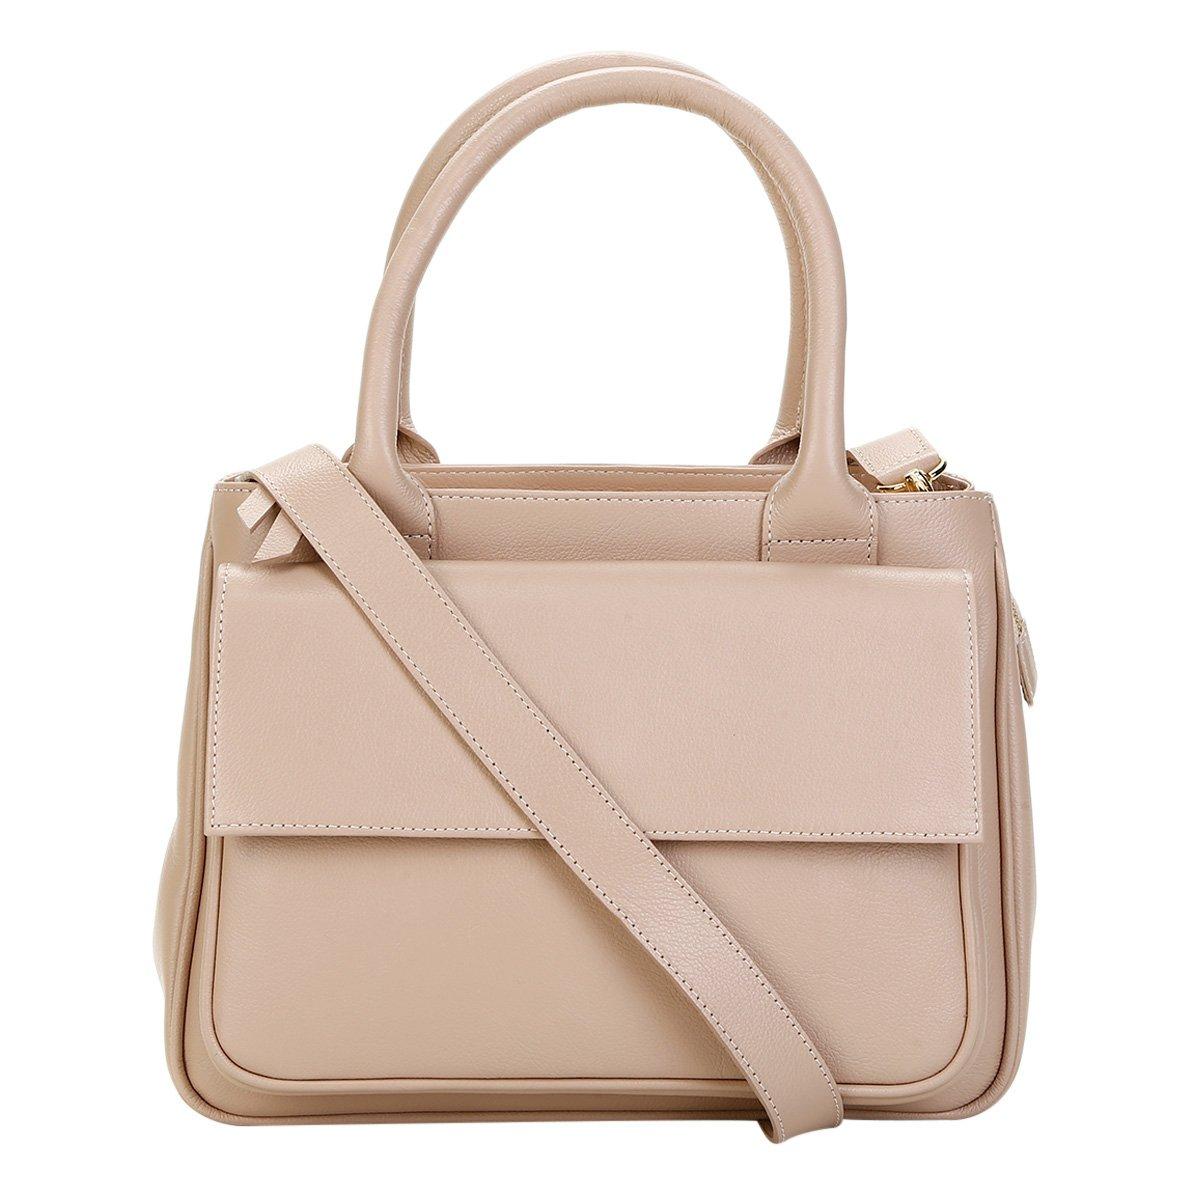 f633942d5 Bolsa Couro Shoestock Satchel Transversal Feminina - Bege - Compre Agora |  Shoestock